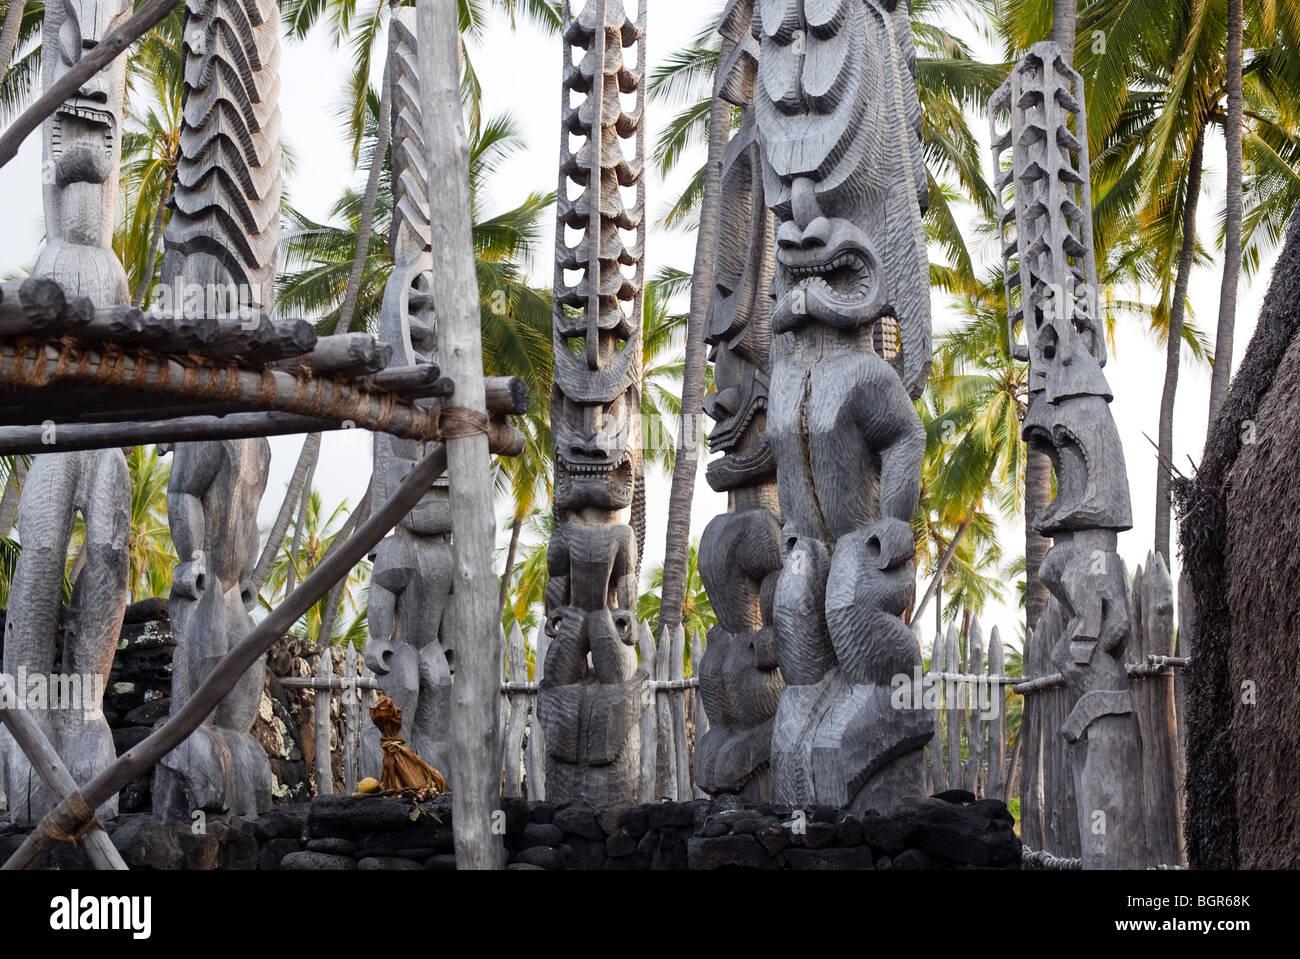 Tiki statues at the Pu`uhonua o Honaunau (place of refuge) on the Big Island in Hawaii - Stock Image